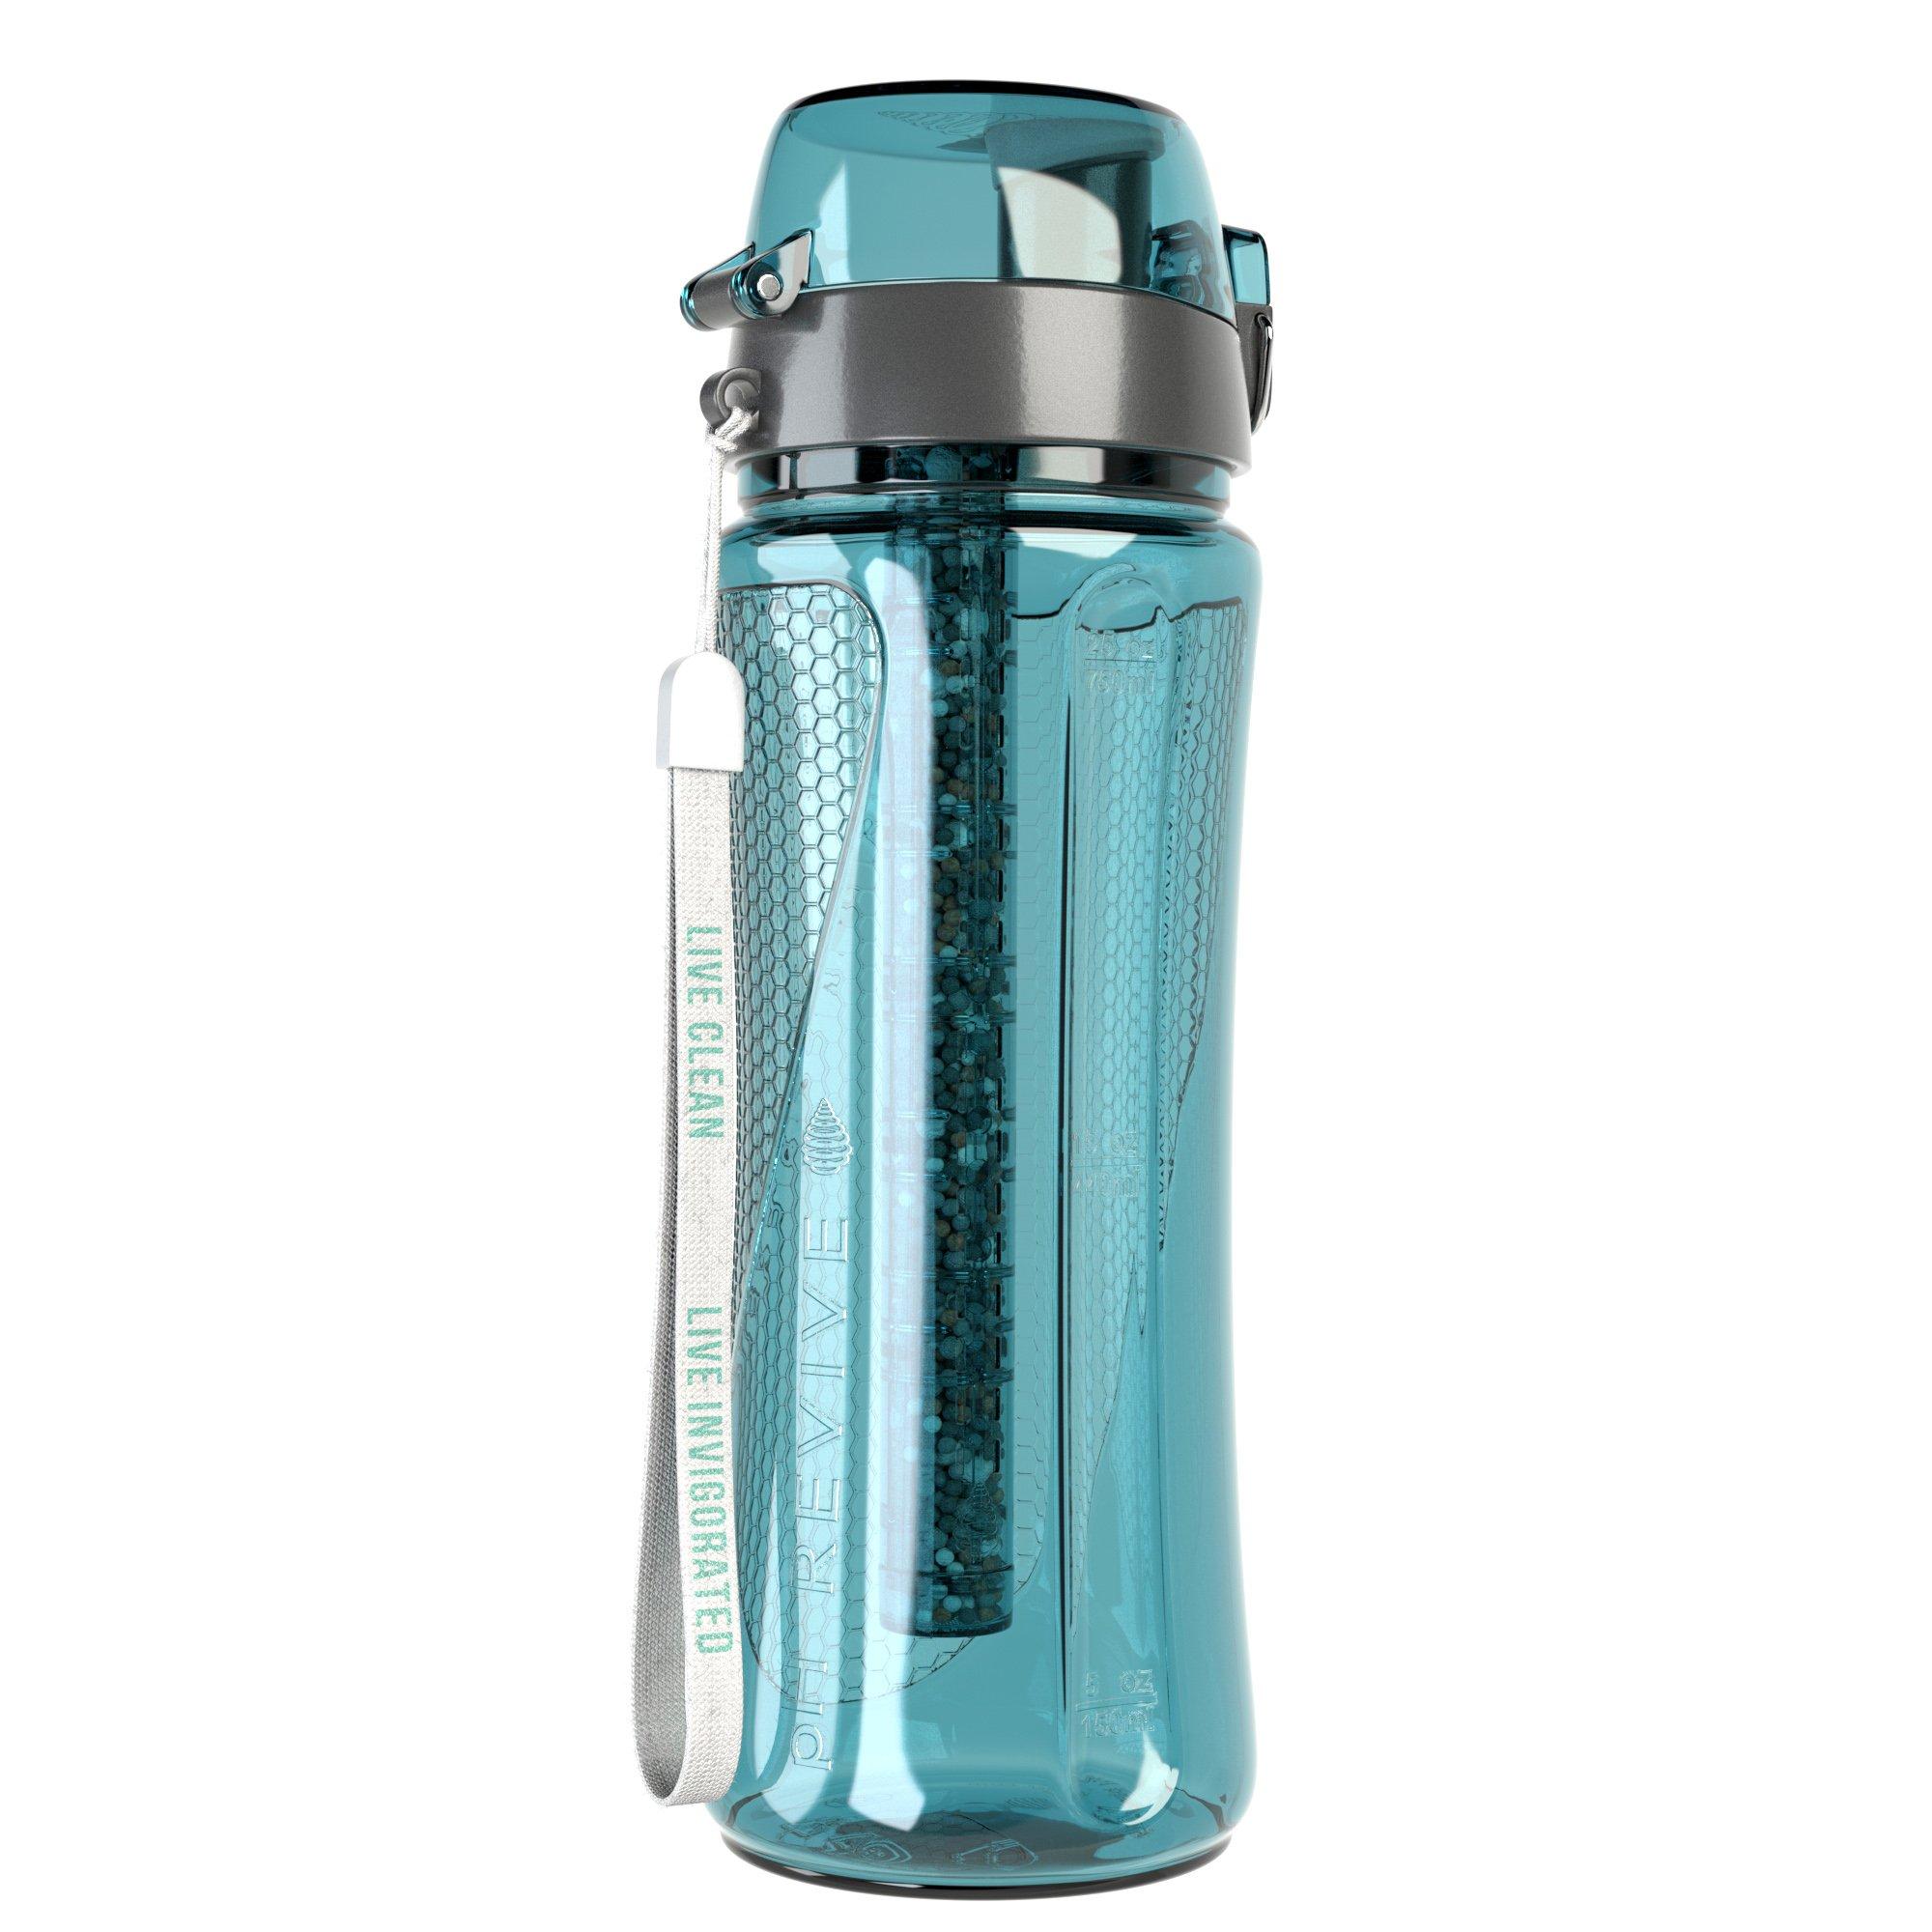 pH REVIVE Alkaline Water Bottle & Carry Case – Alkaline Water Filter - Alkaline Water Ionizer – Filtered Water Bottle – Water Filtration System, 25oz, 750ml (Aqua)